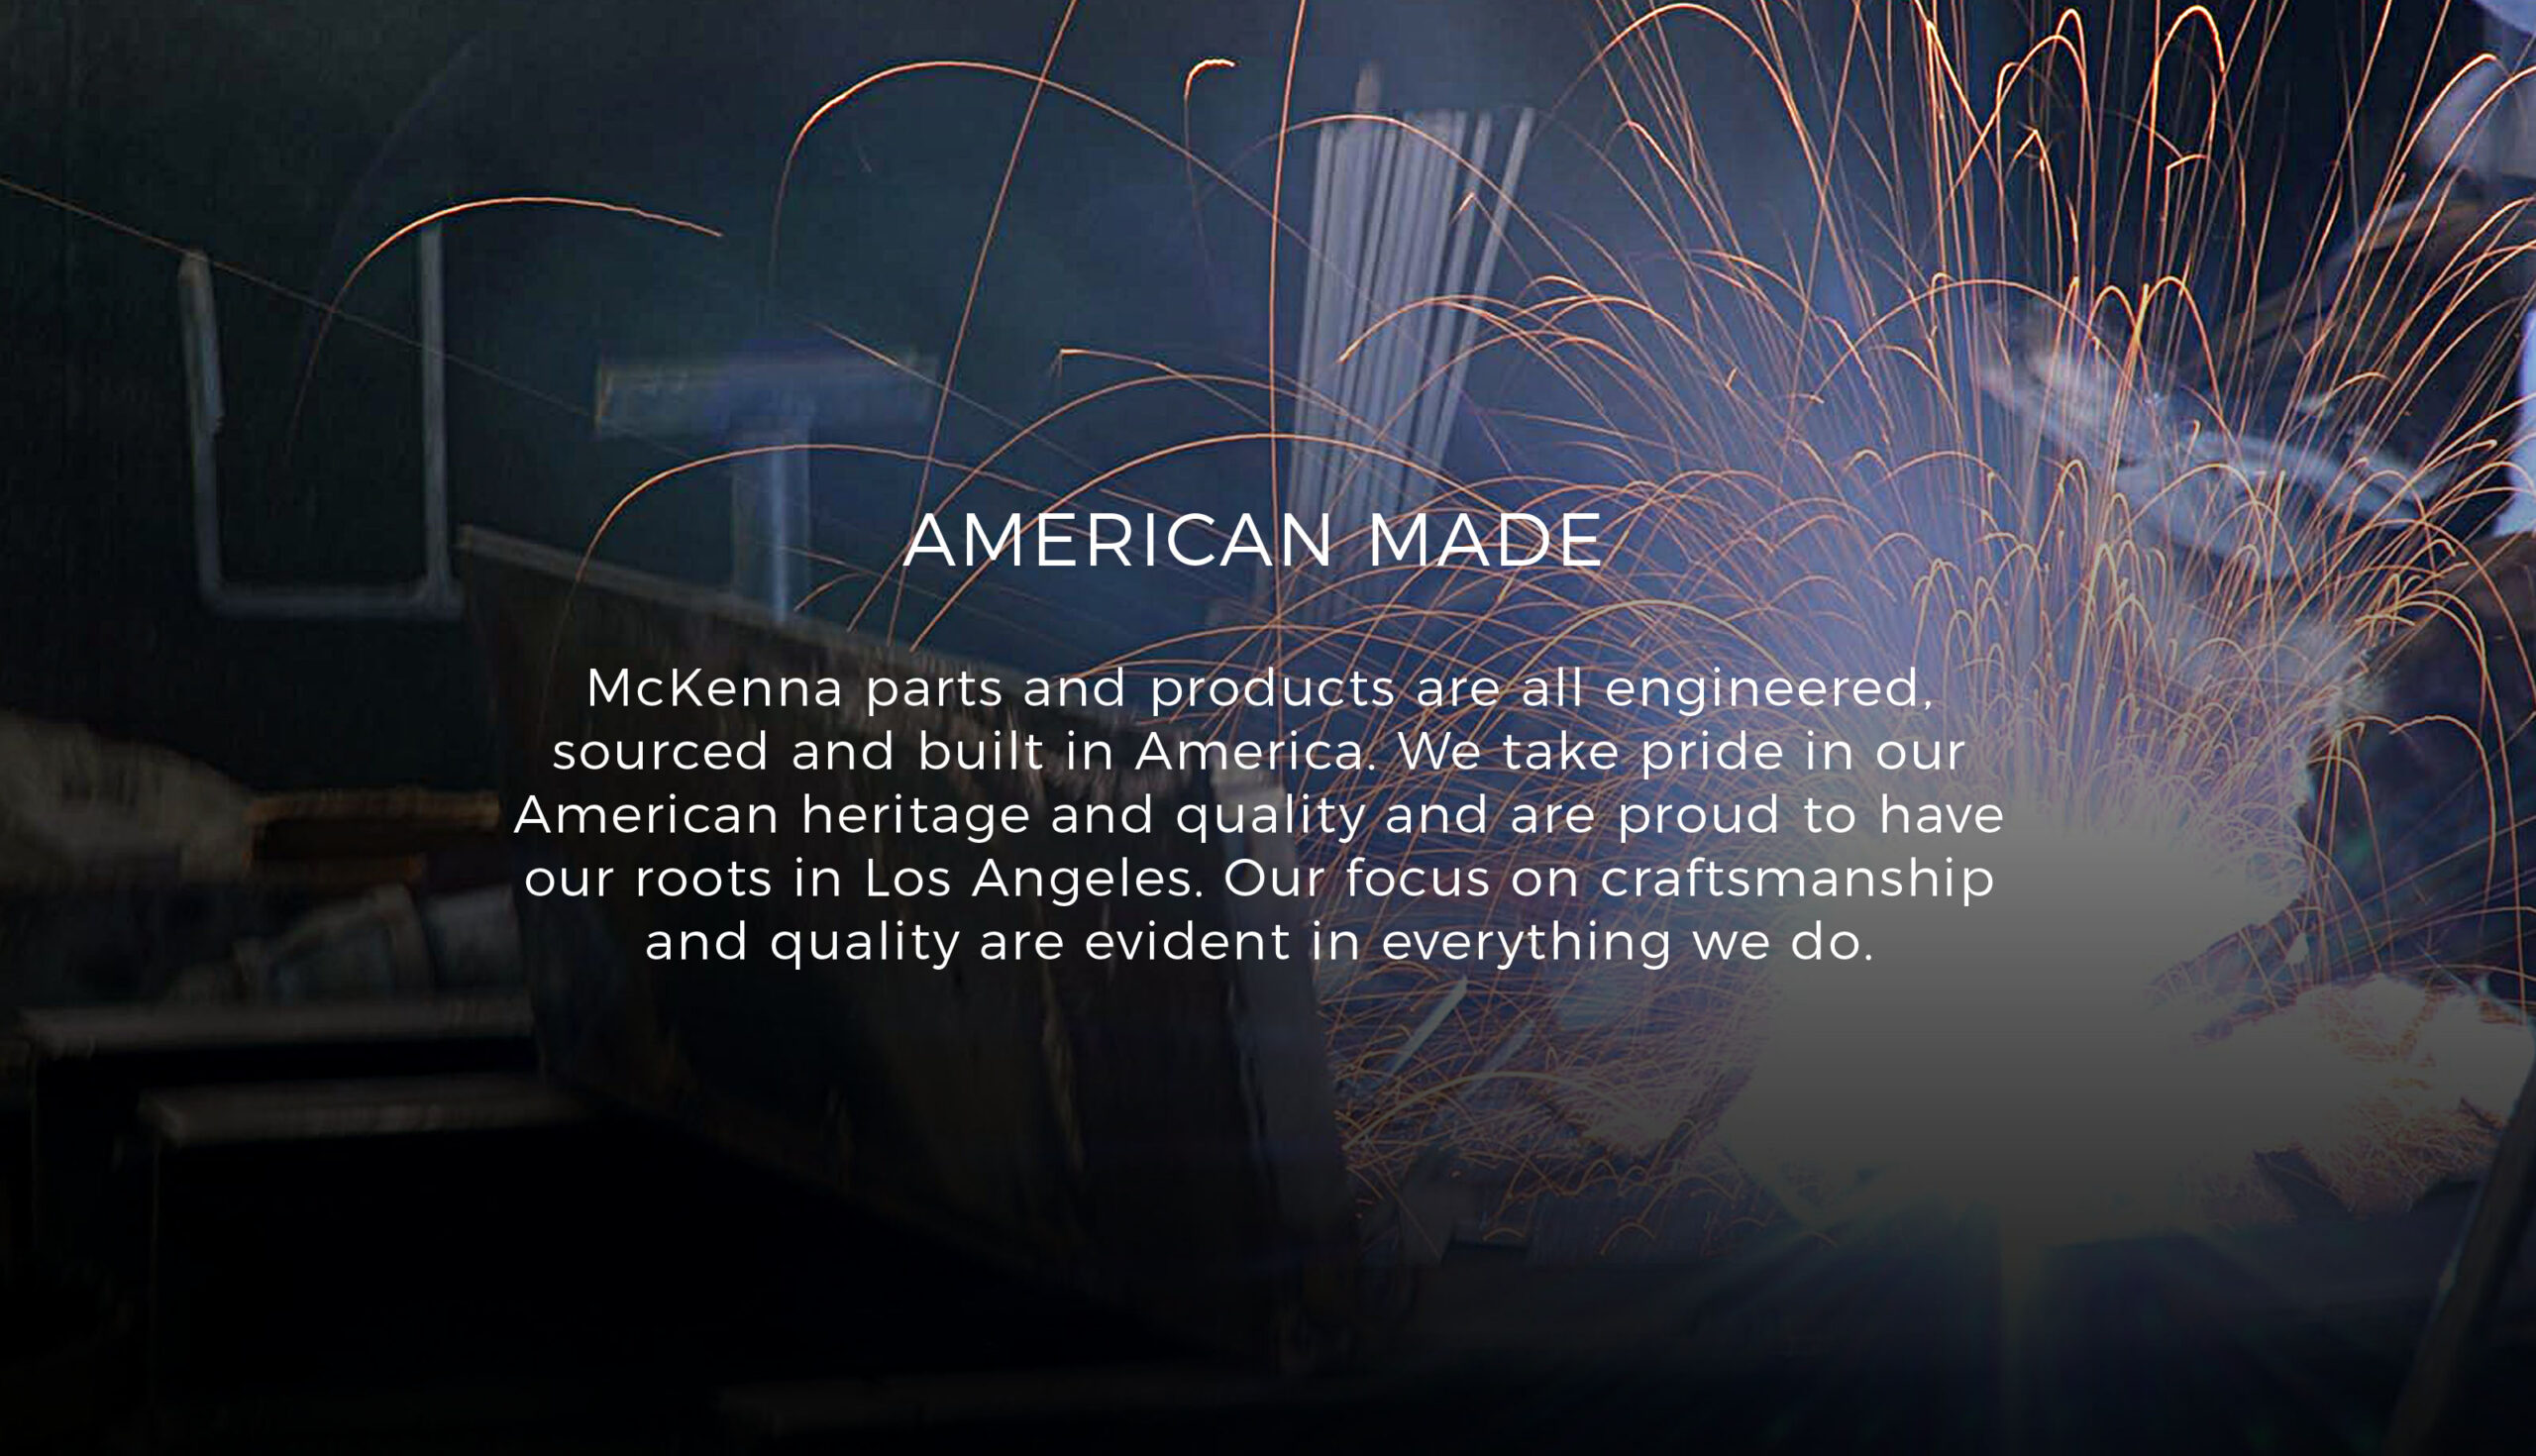 McKenna American made